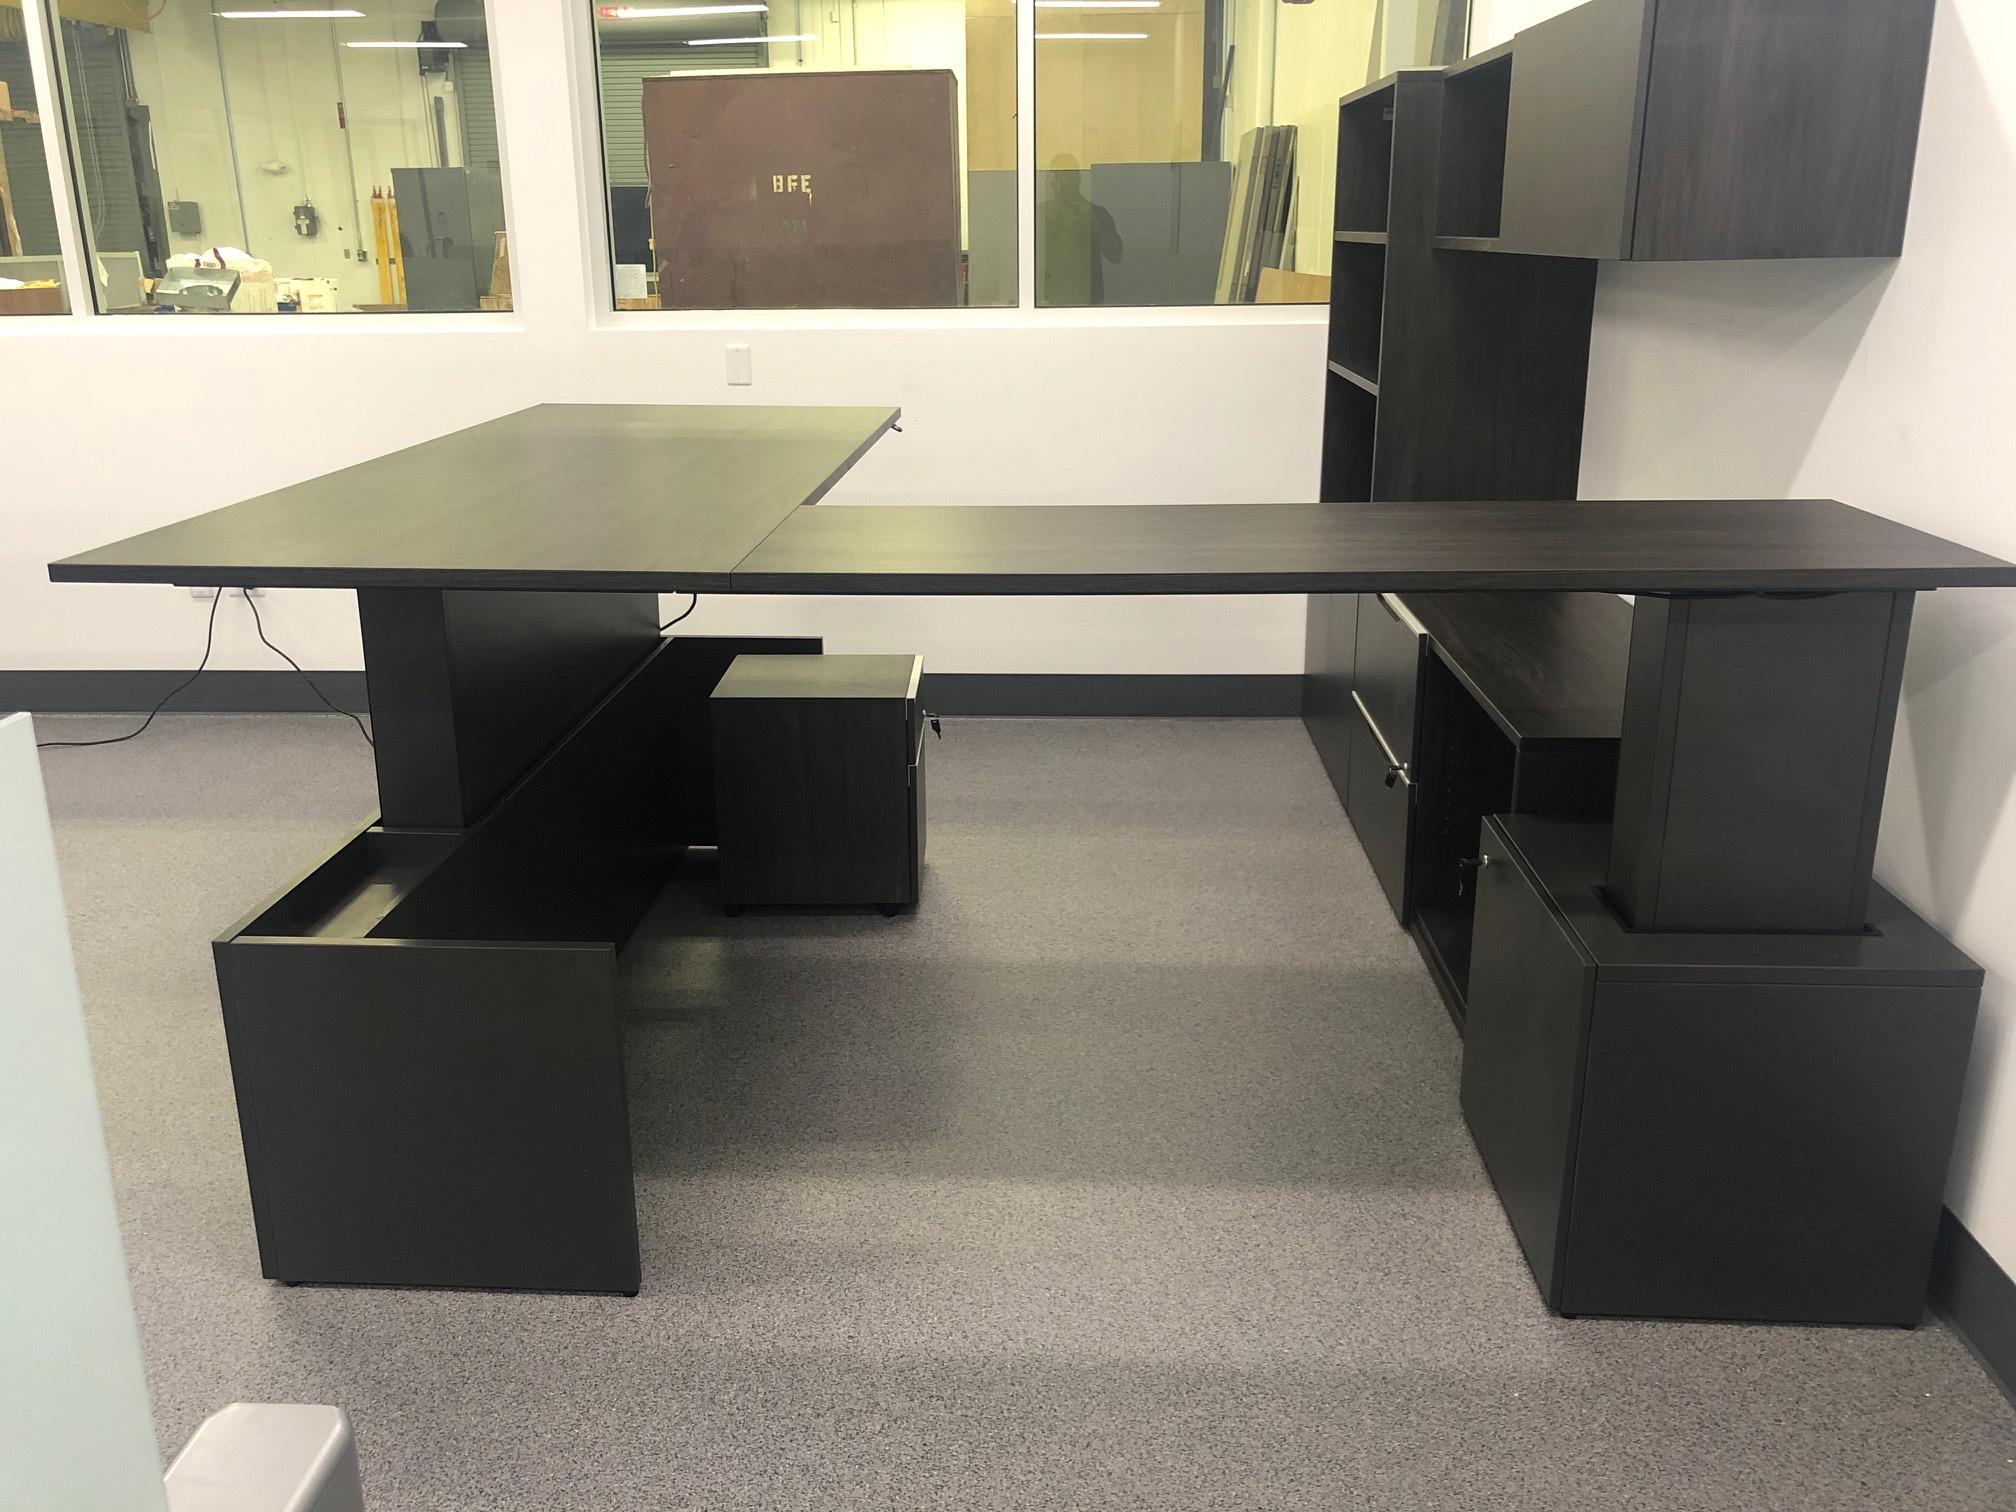 business-furniture-suppliers-in-gainesville-florida-1-5-.jpg